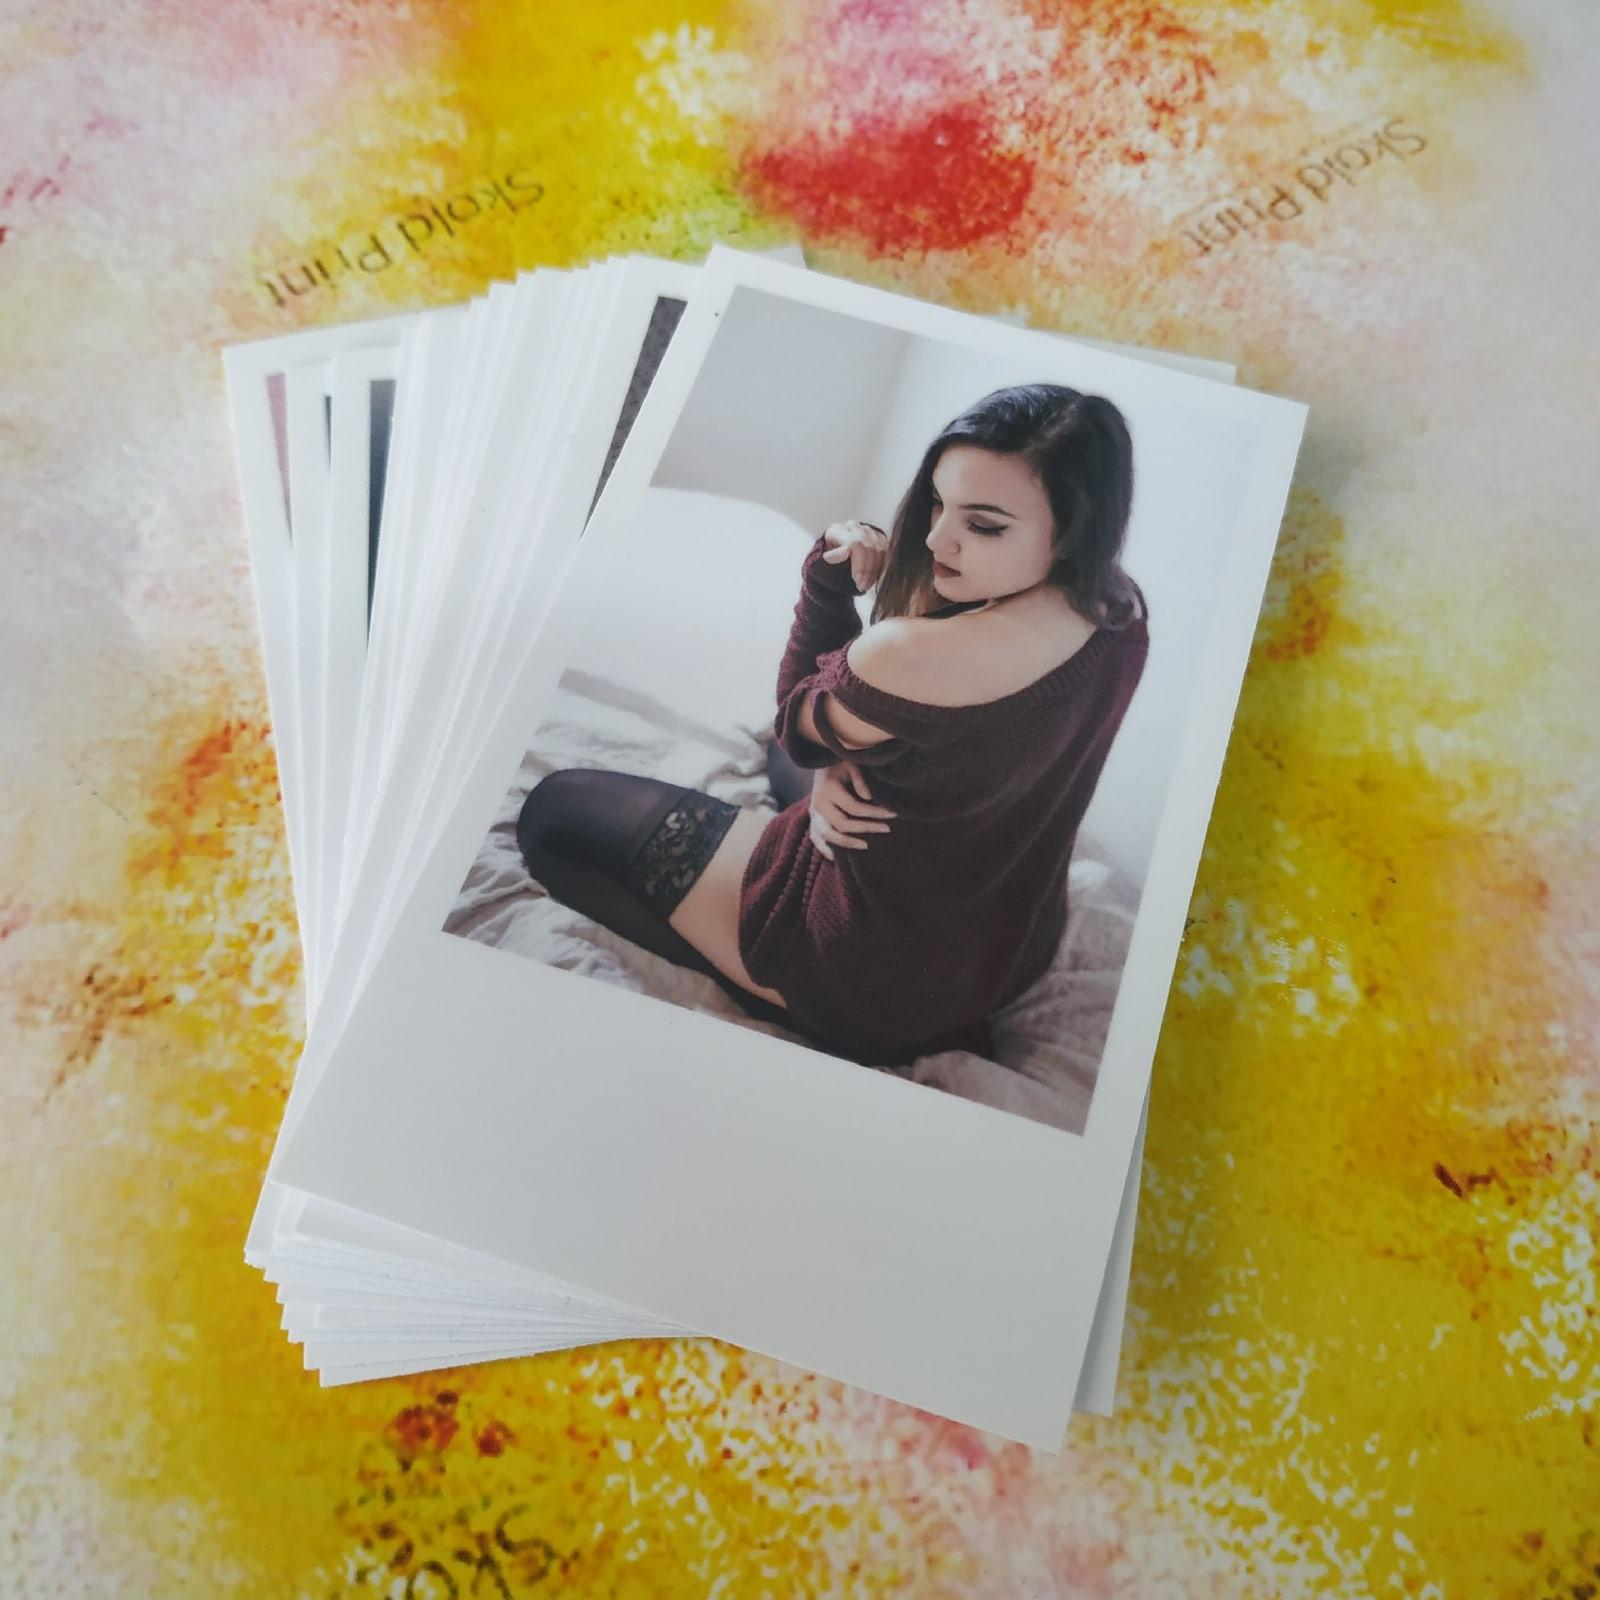 Печать фото в формате интакс мини